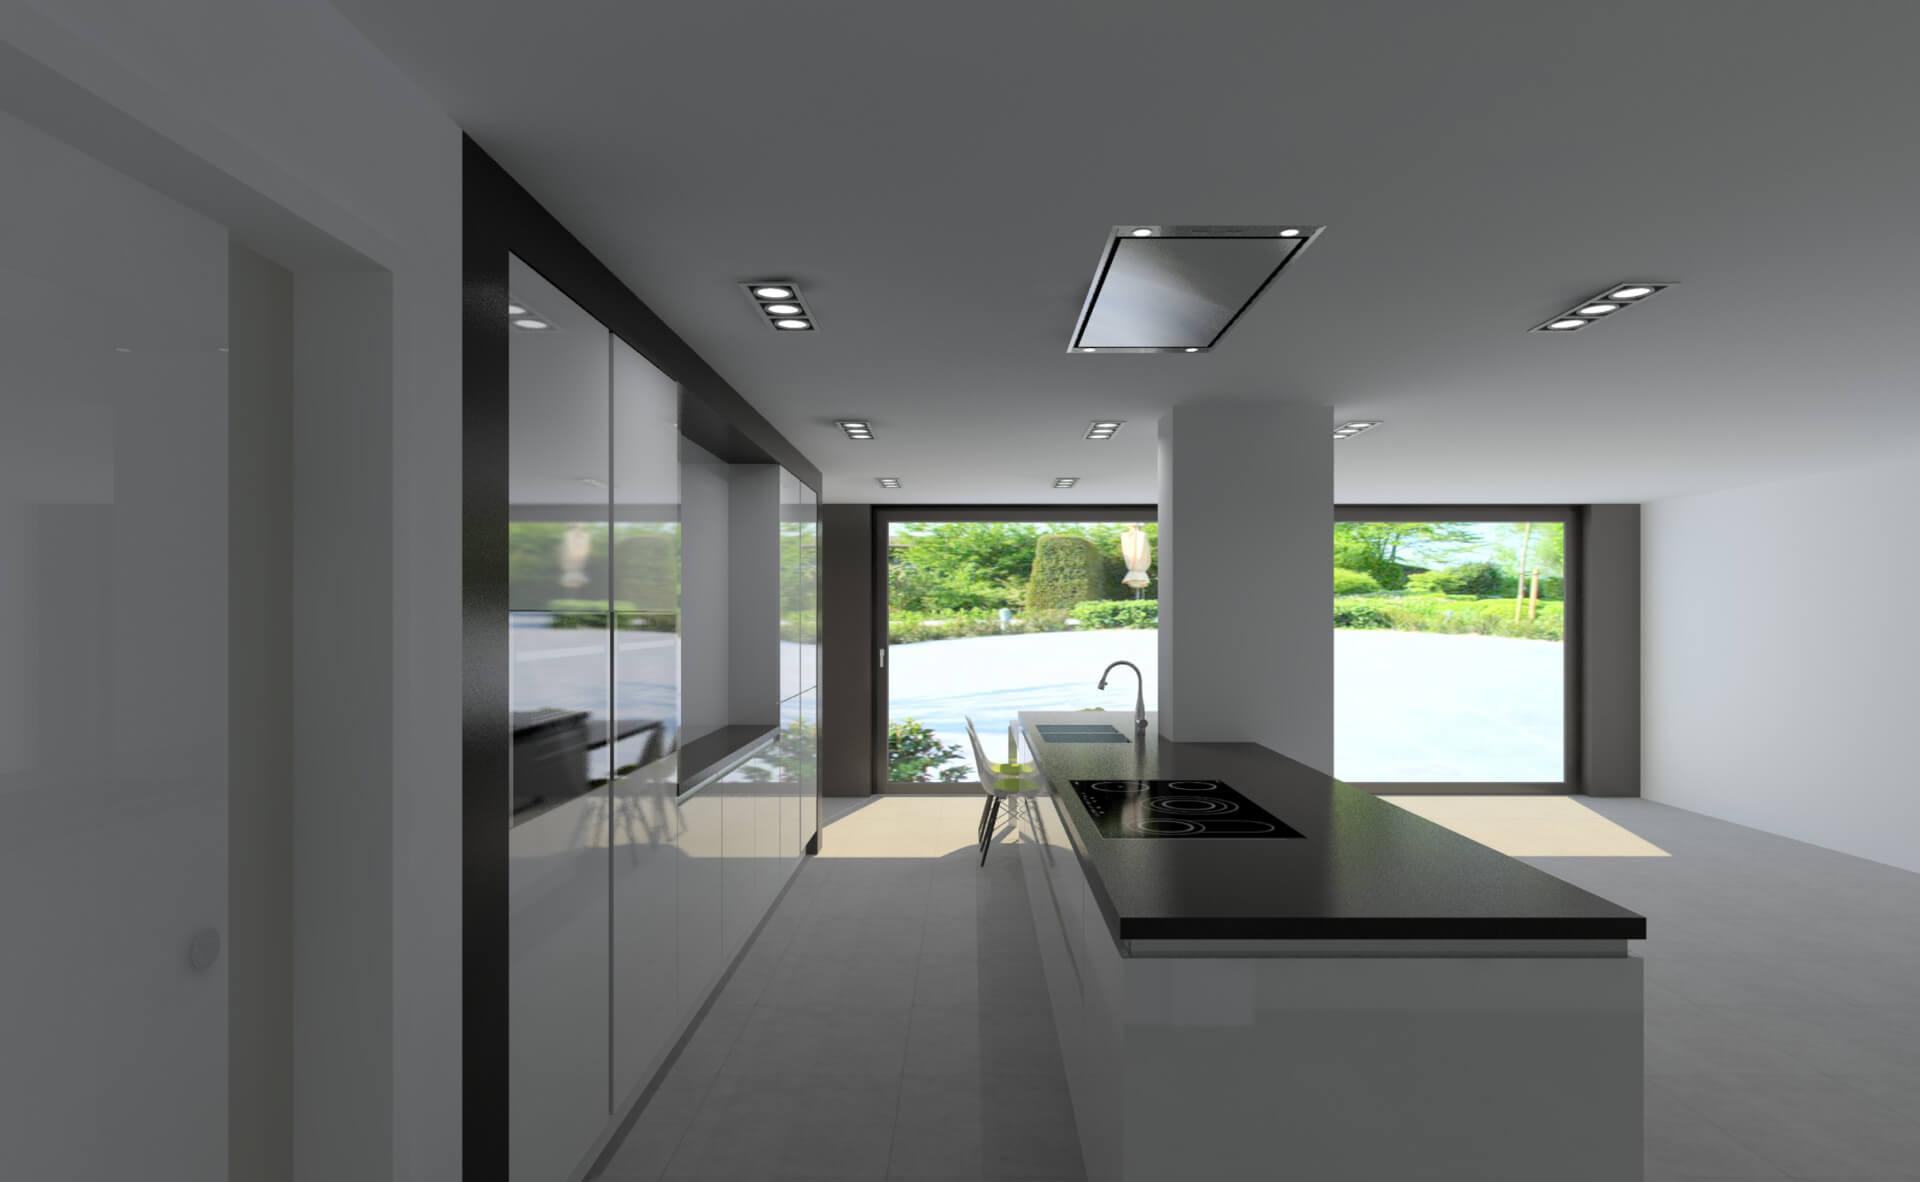 Tekenprogramma Keukens ~ Referenties op Huis Ontwerp, Interieur ...